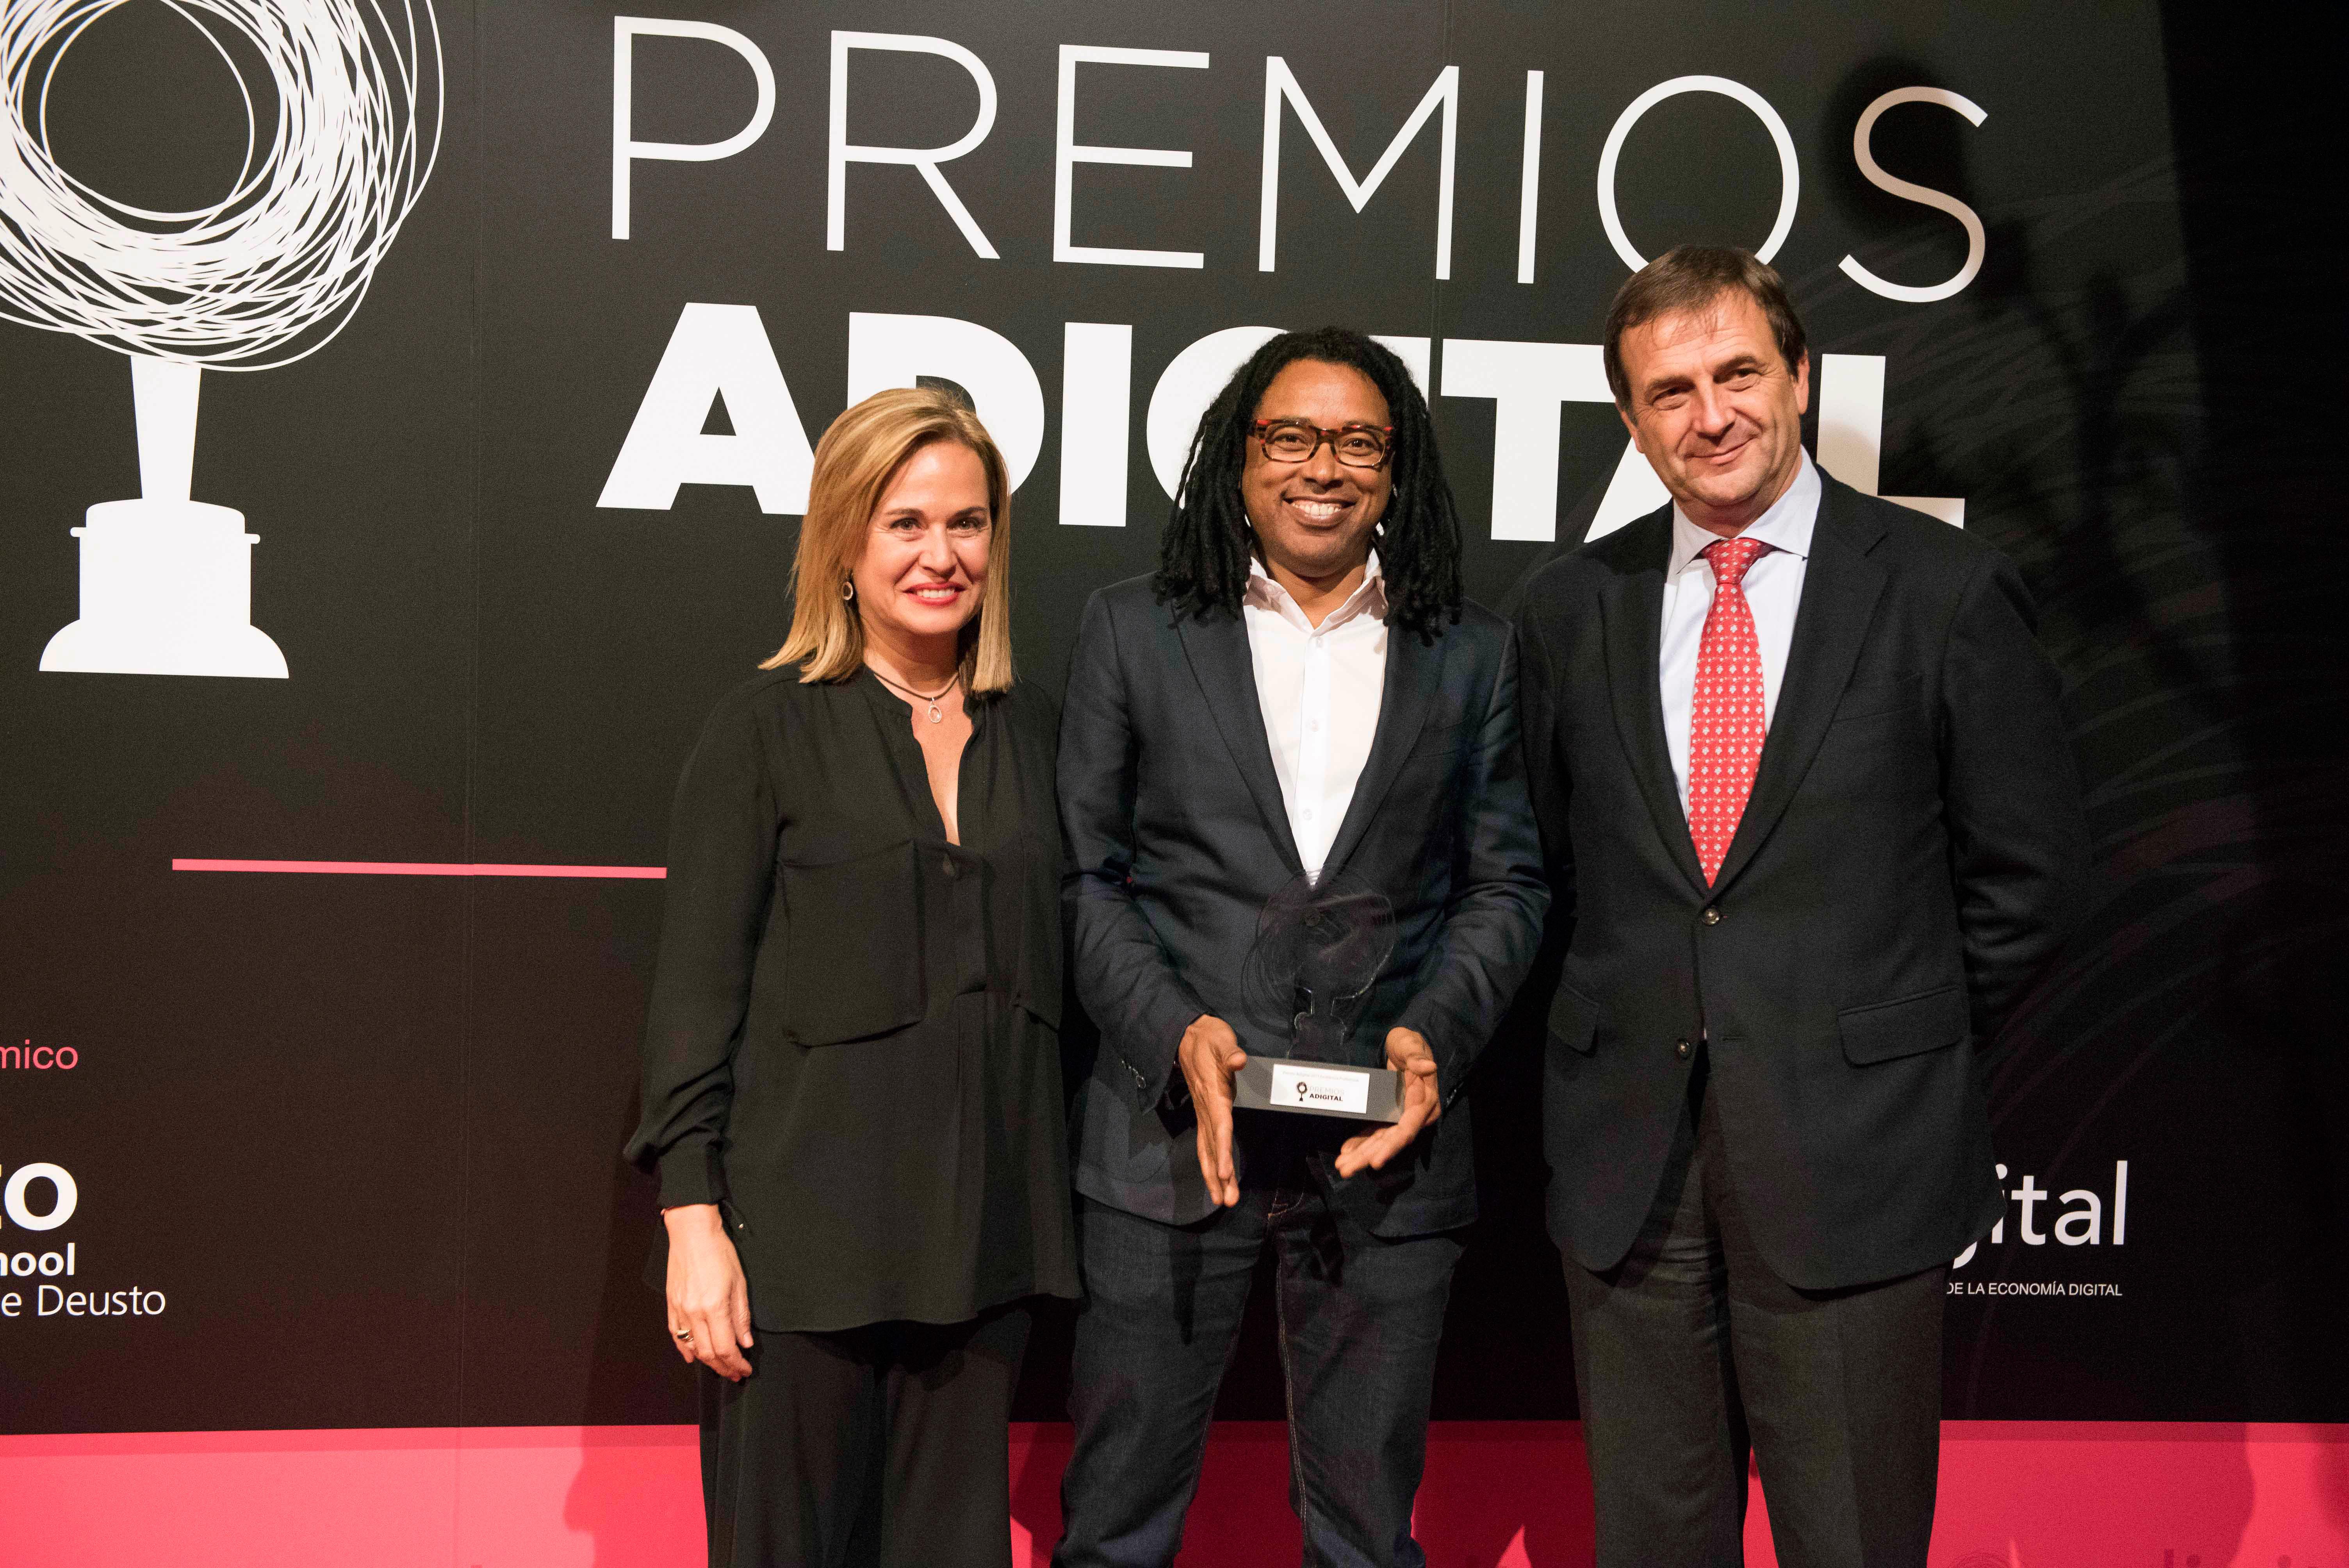 Premio Excelencia Porfesional_Amuda_Adigital 20151119